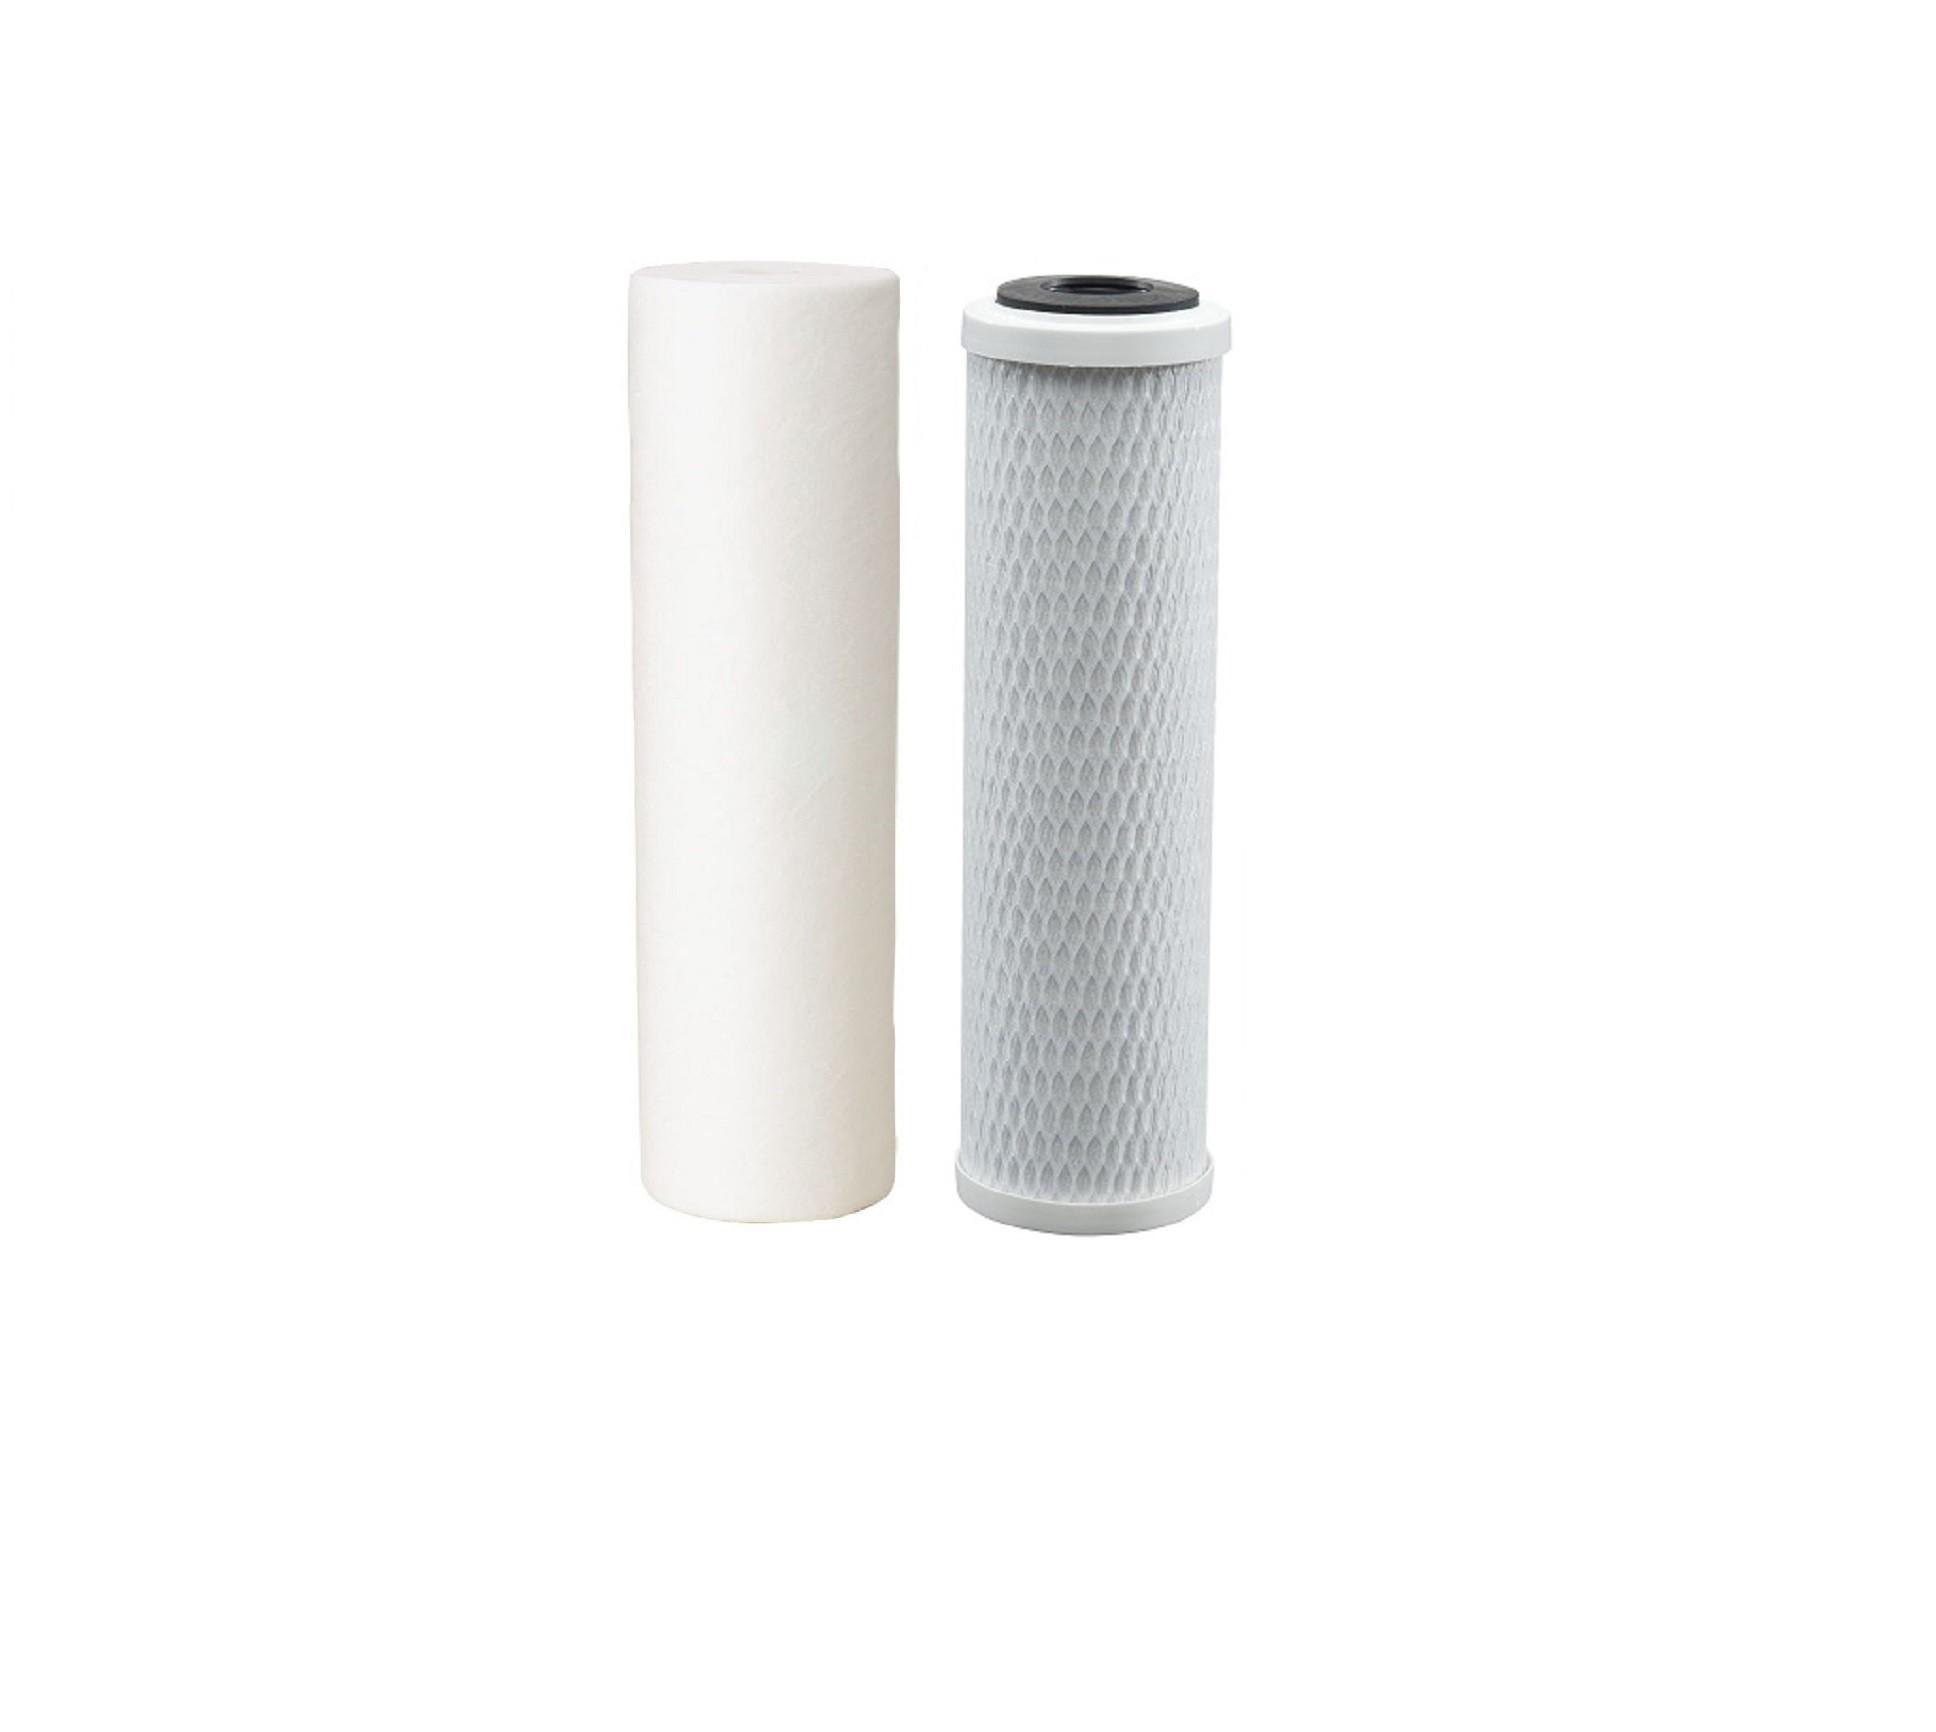 Refil para purificadores AS2 / FD 10 / Multi 1500 / Duplo 10 Filtre